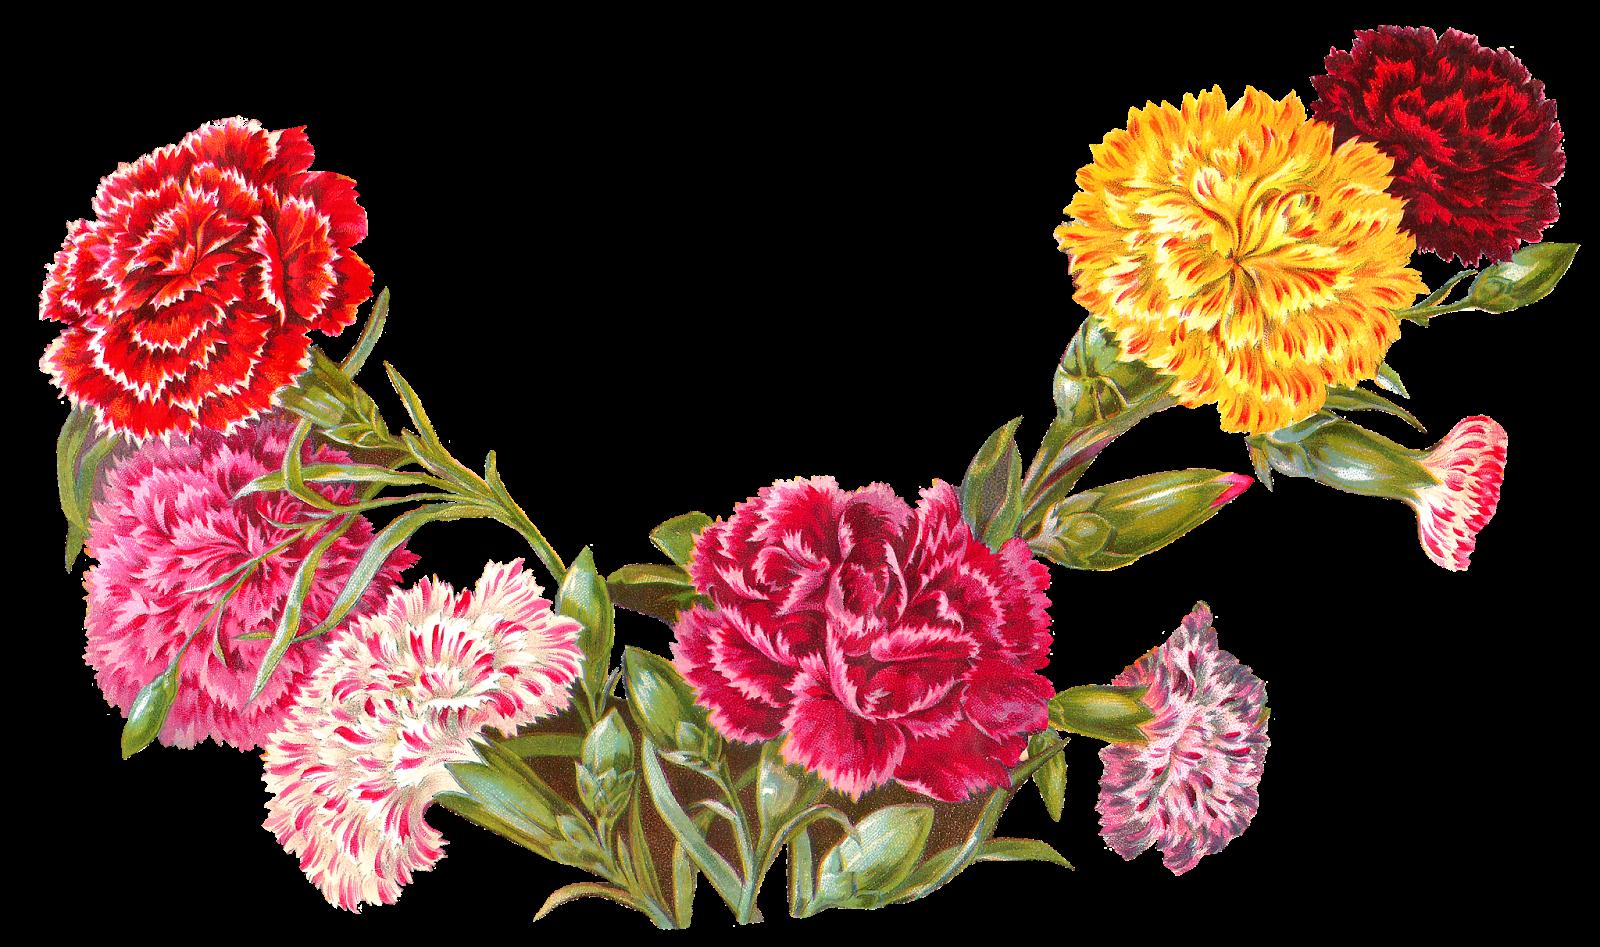 Bright flower clipart jpg freeuse stock Antique Images: Old Botanical Art Carnation Illustration Digital ... jpg freeuse stock